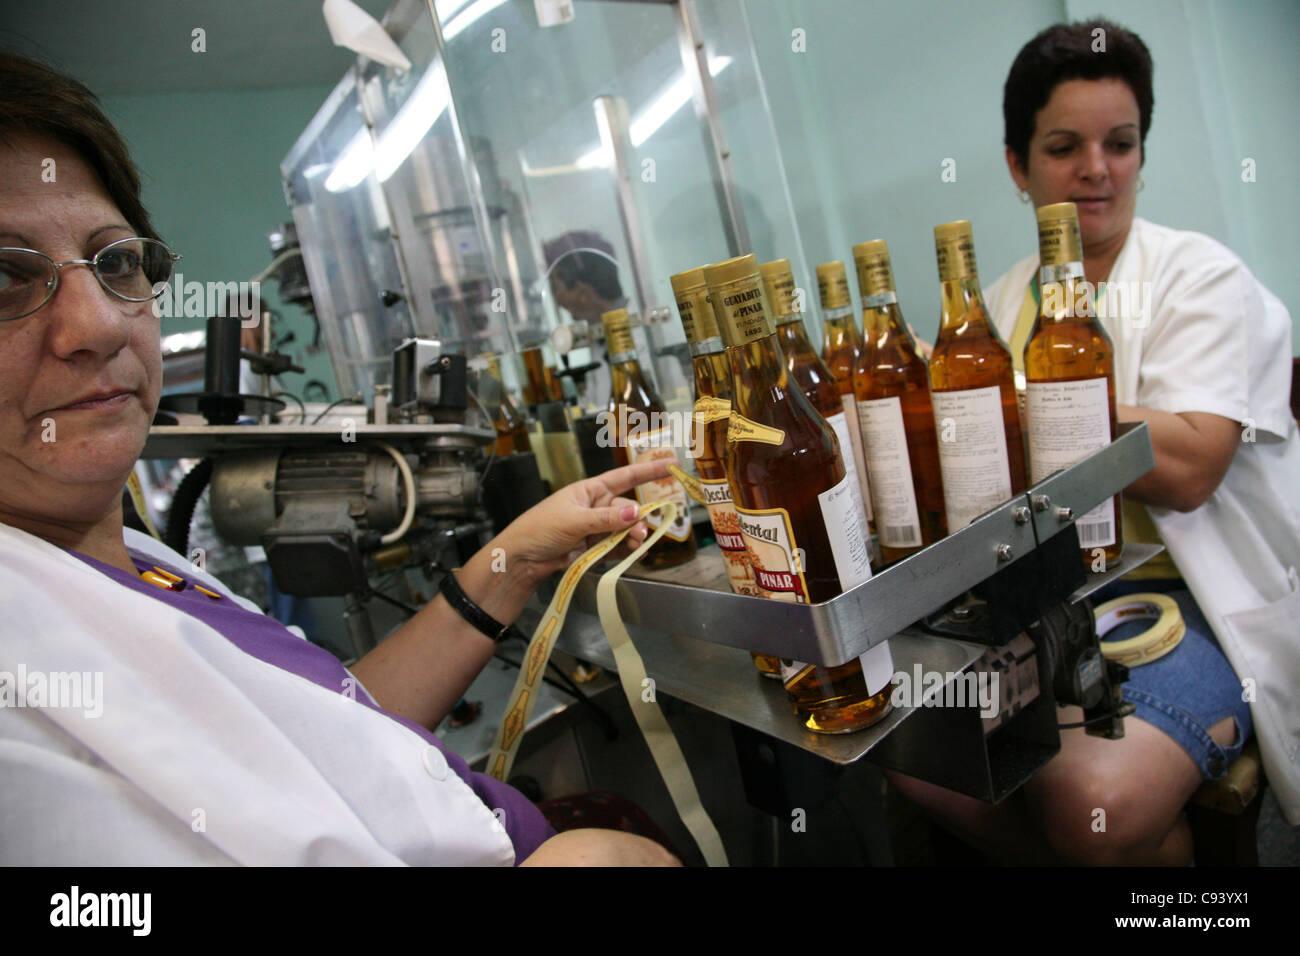 Workers stick labels at the bottles at the rum factory Fabrica de Bebidas Casa Garay in Pinar del Rio, Cuba. Stock Photo